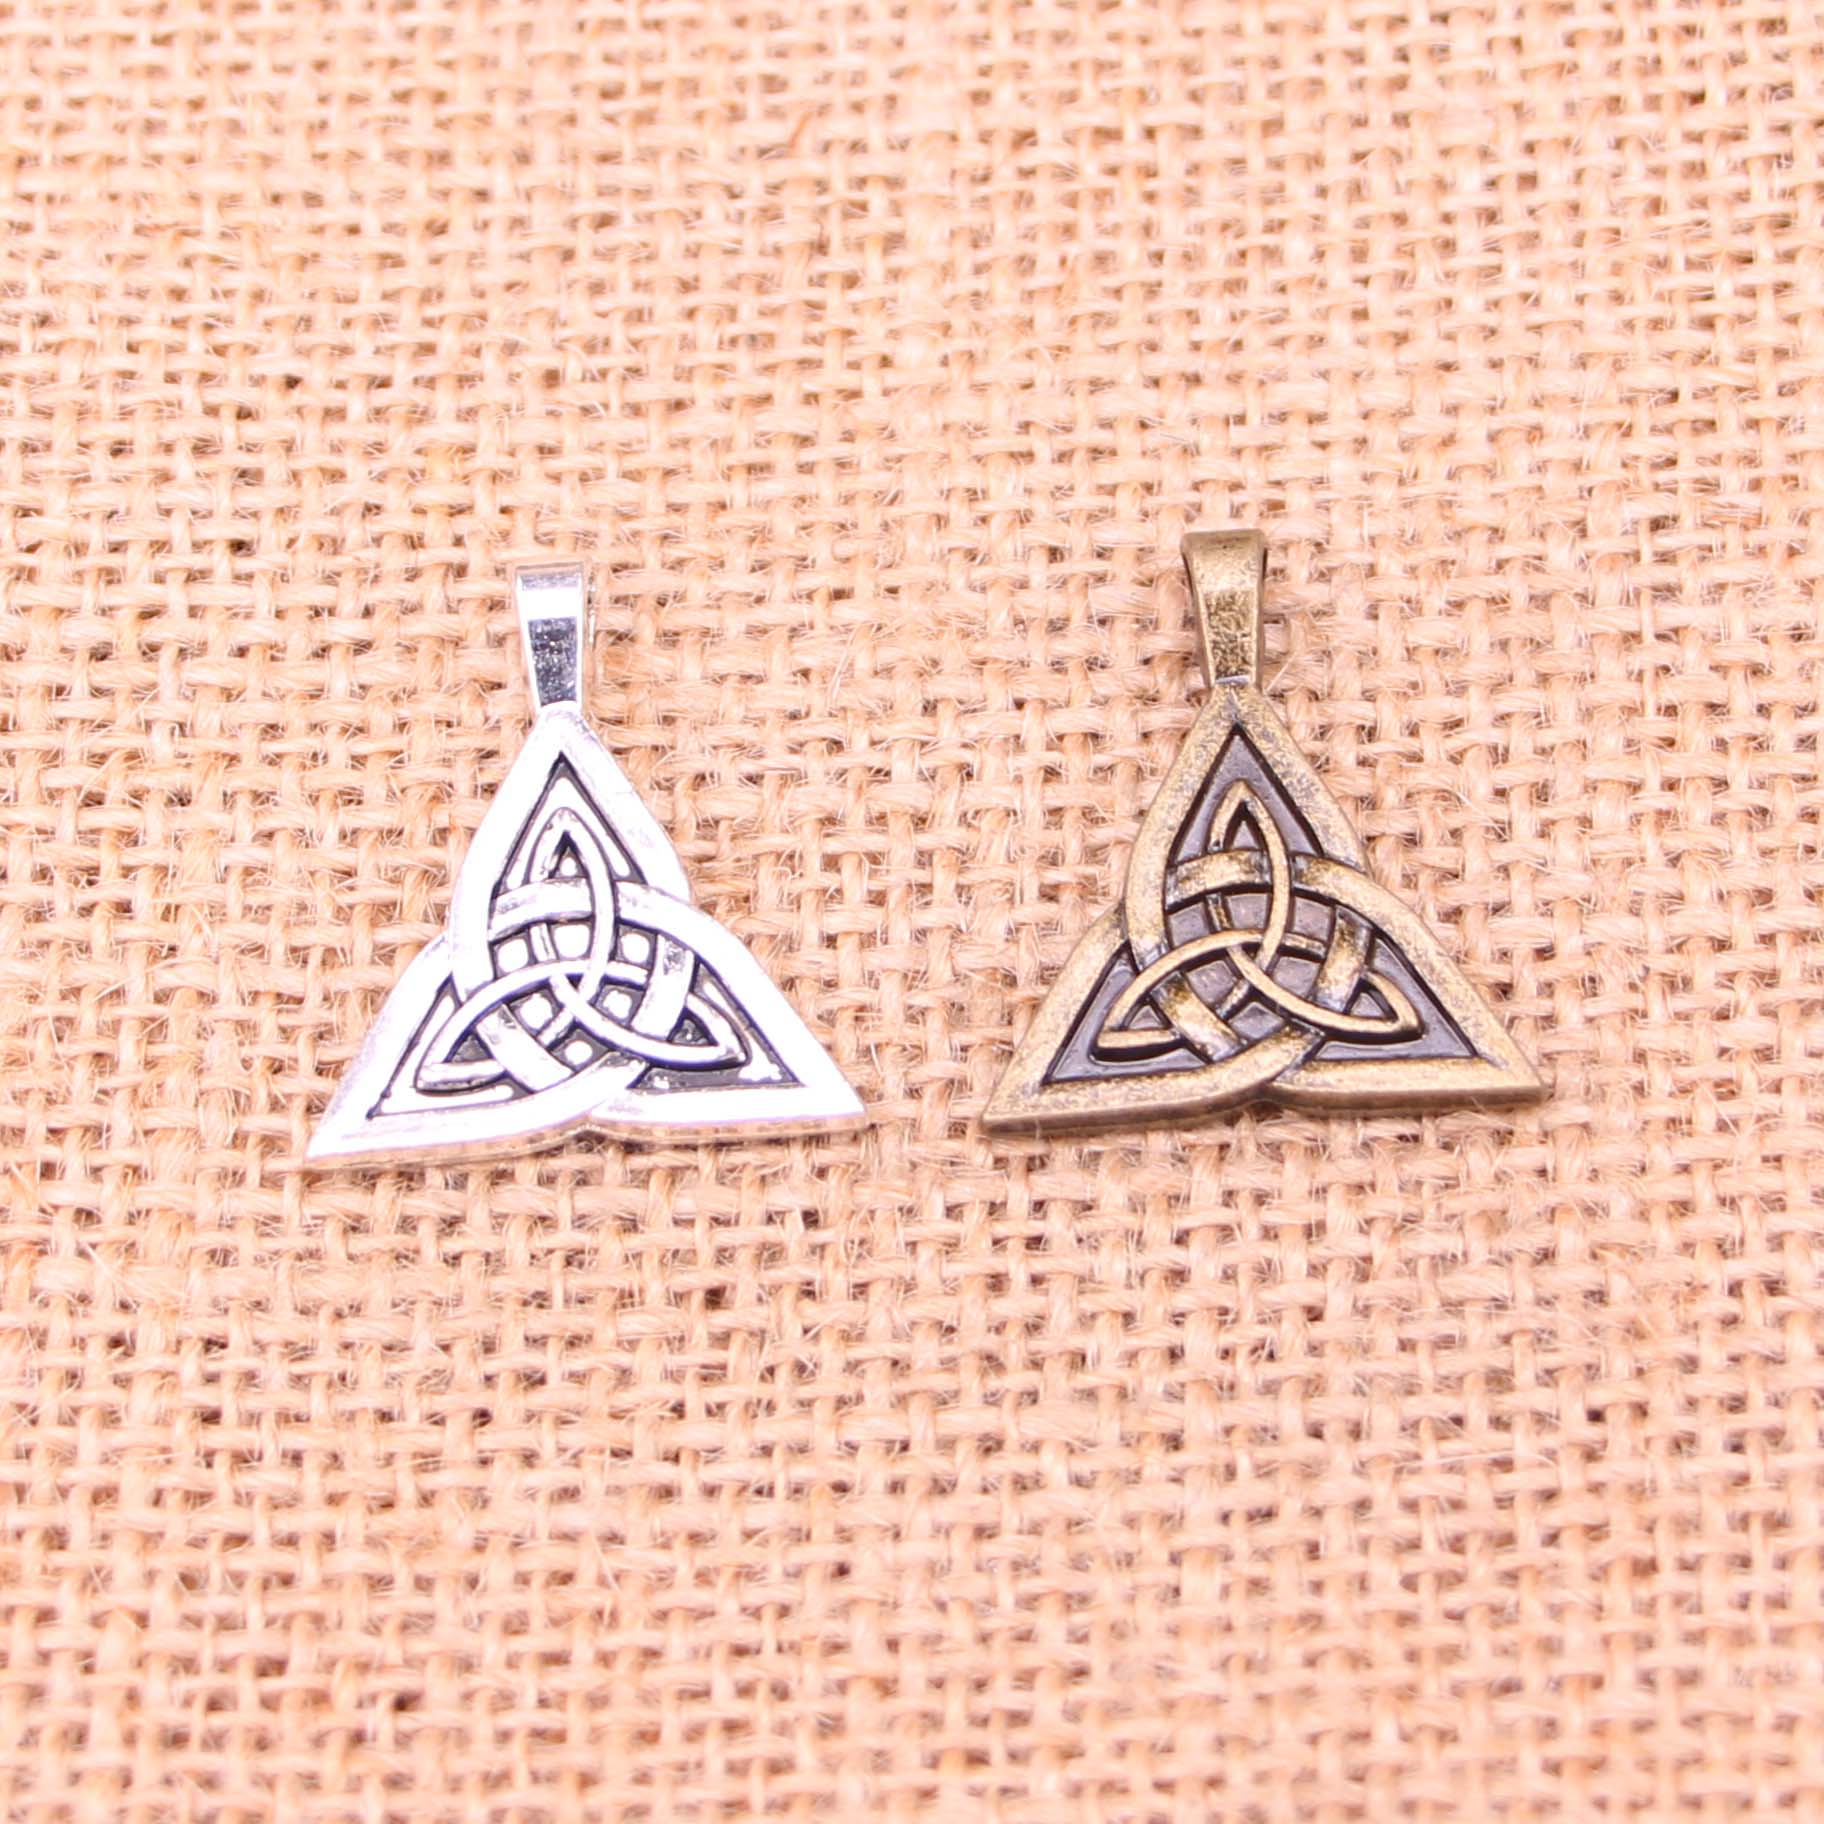 7 Uds nudo celta abalorios tibetanos de plata colgantes plateados para fabricación de joyería DIY hecho a mano 28*24mm